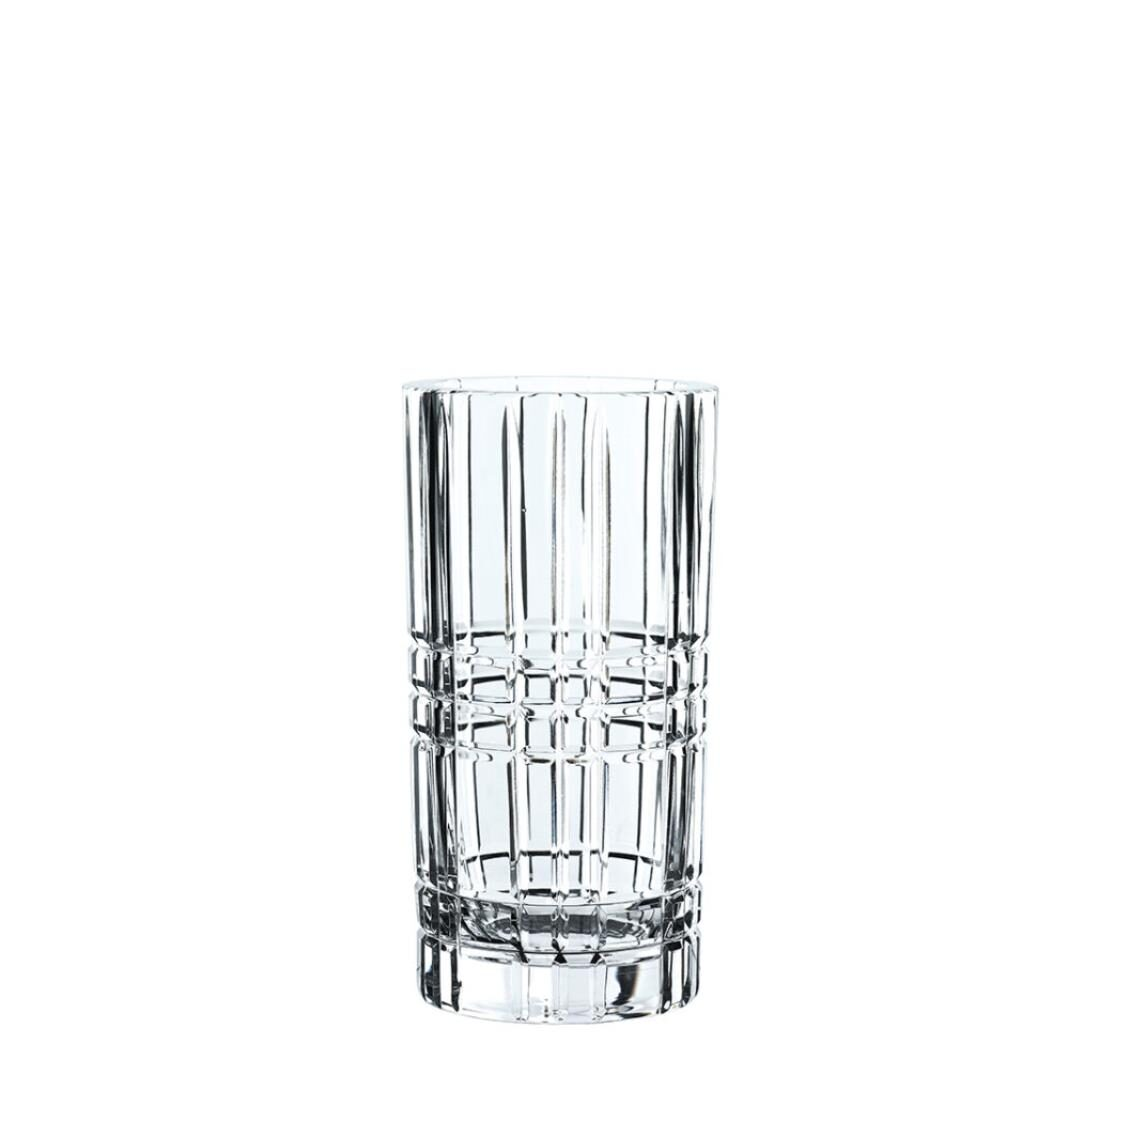 Nachtmann Lead Free Crystal Vase 12xH231cm Square R-97781